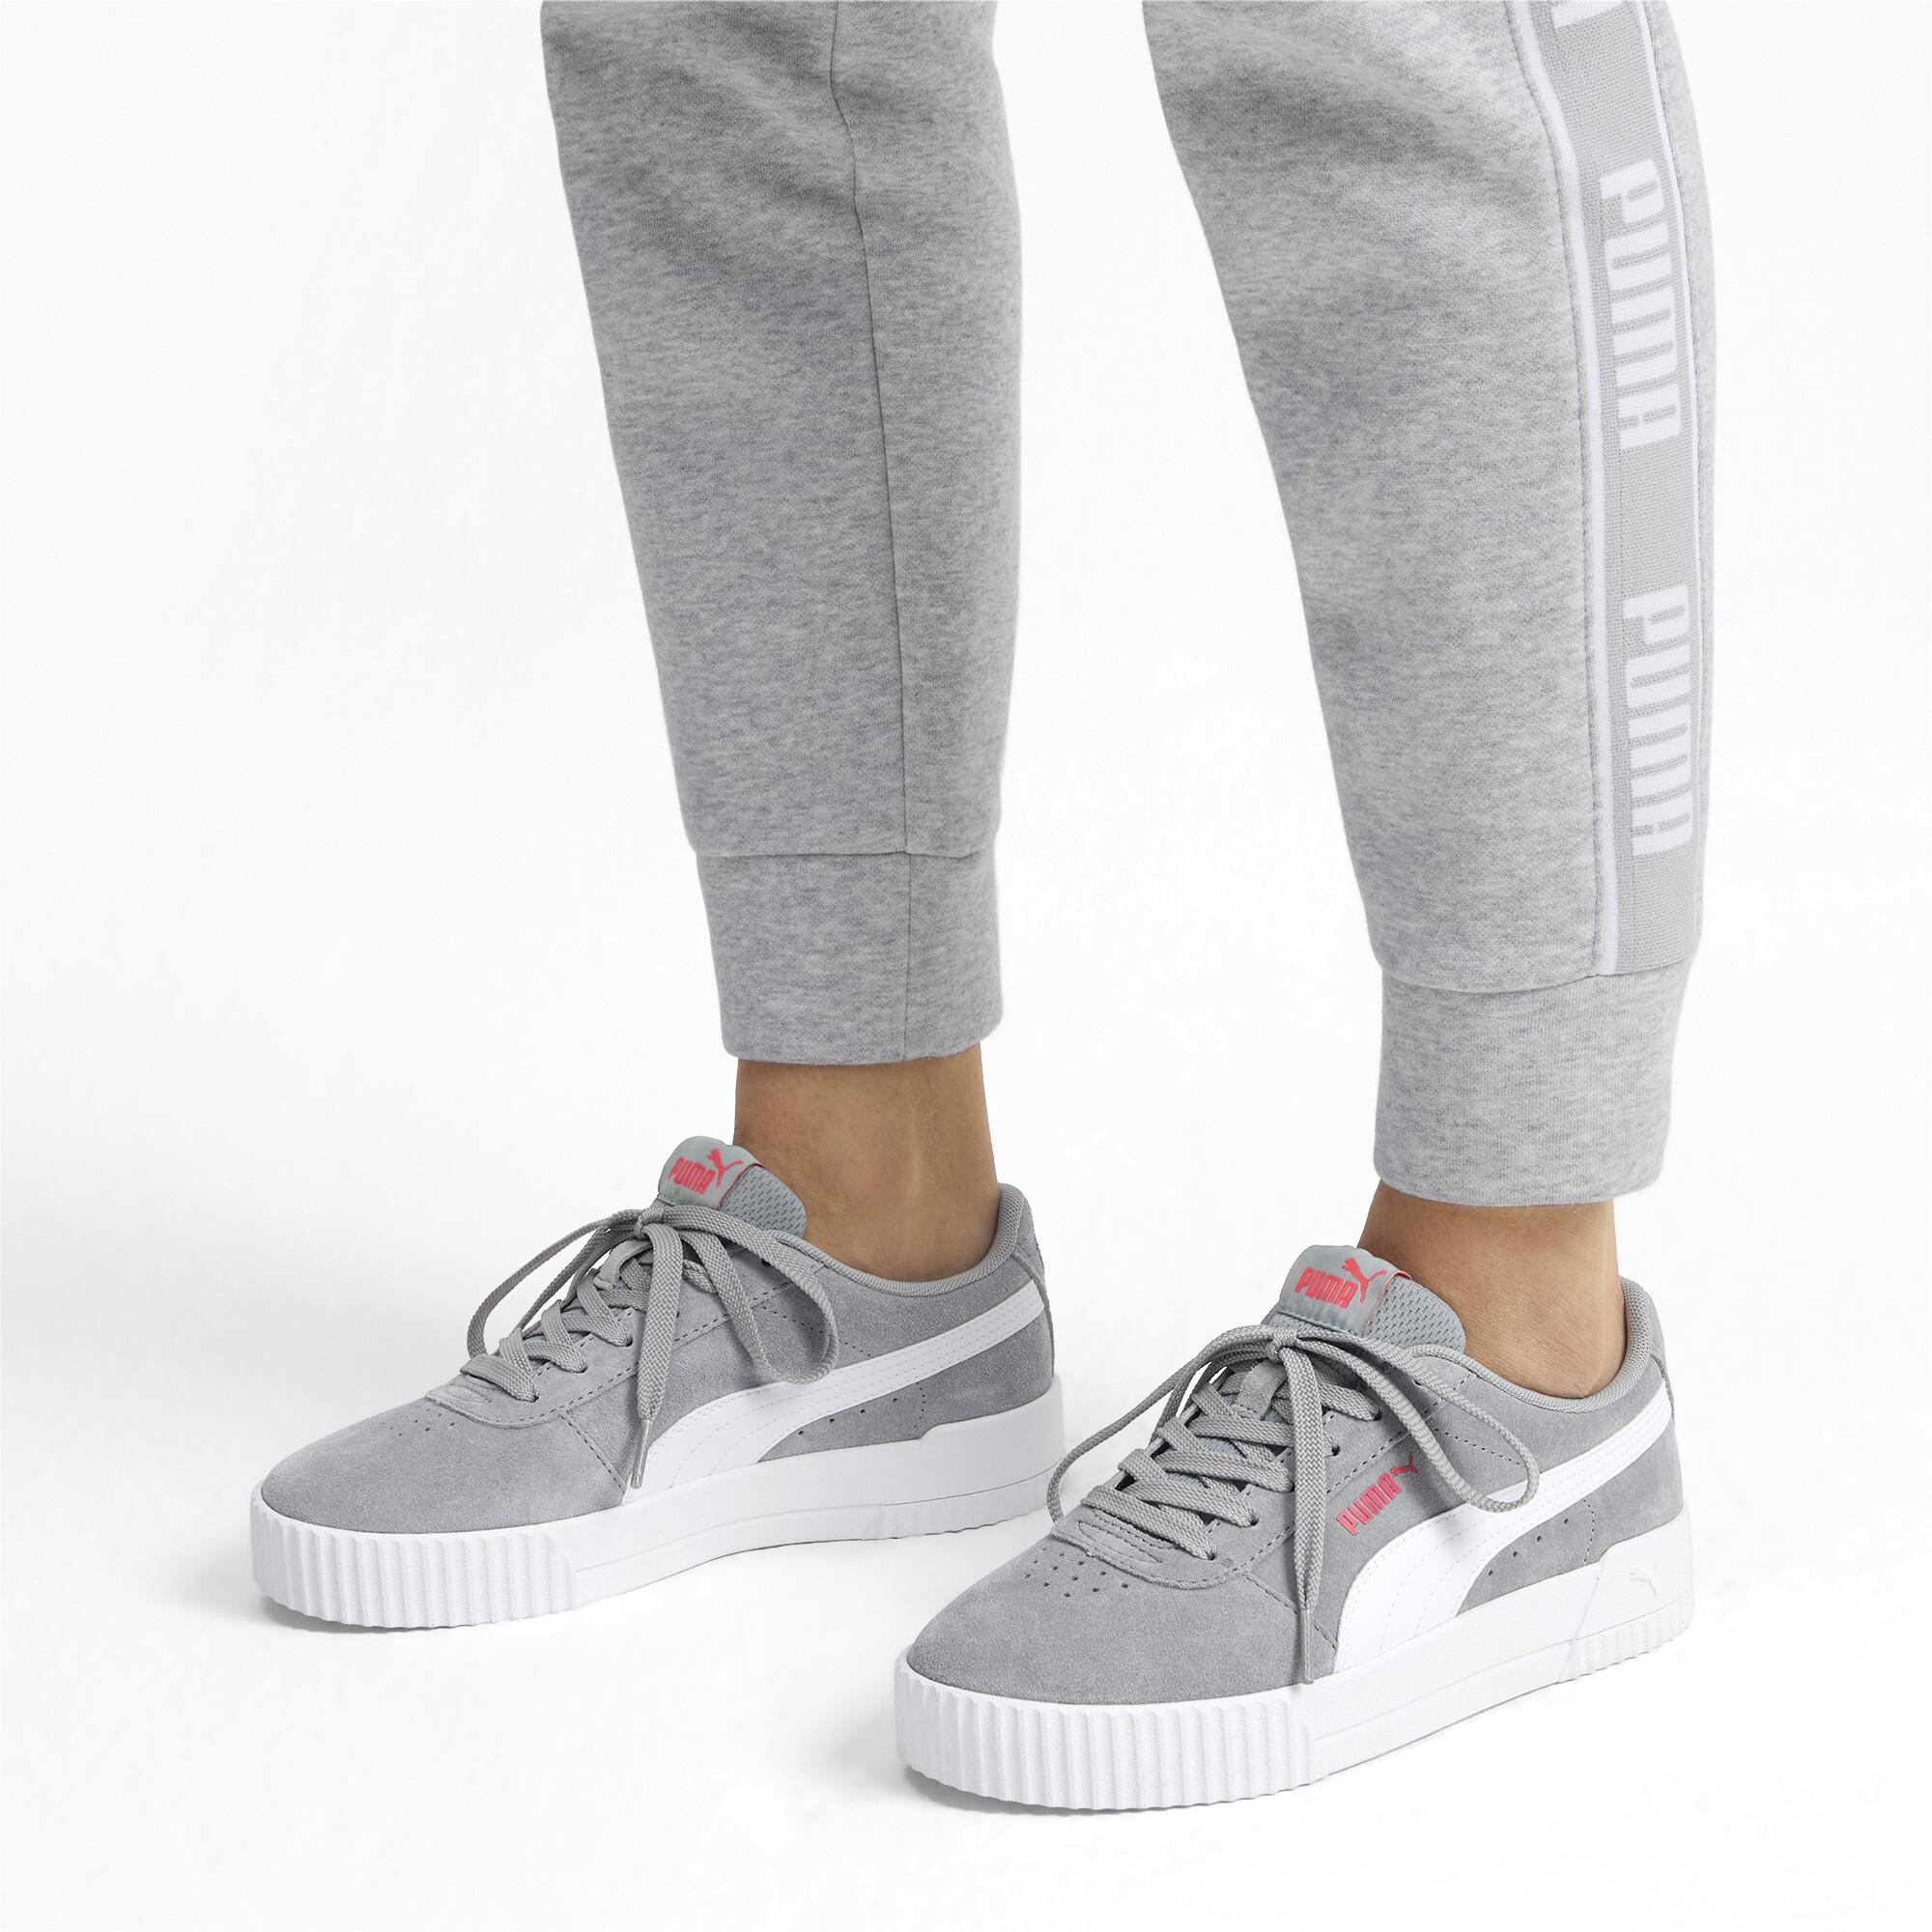 PUMA-Carina-Women-s-Sneakers-Women-Shoe-Basics thumbnail 5